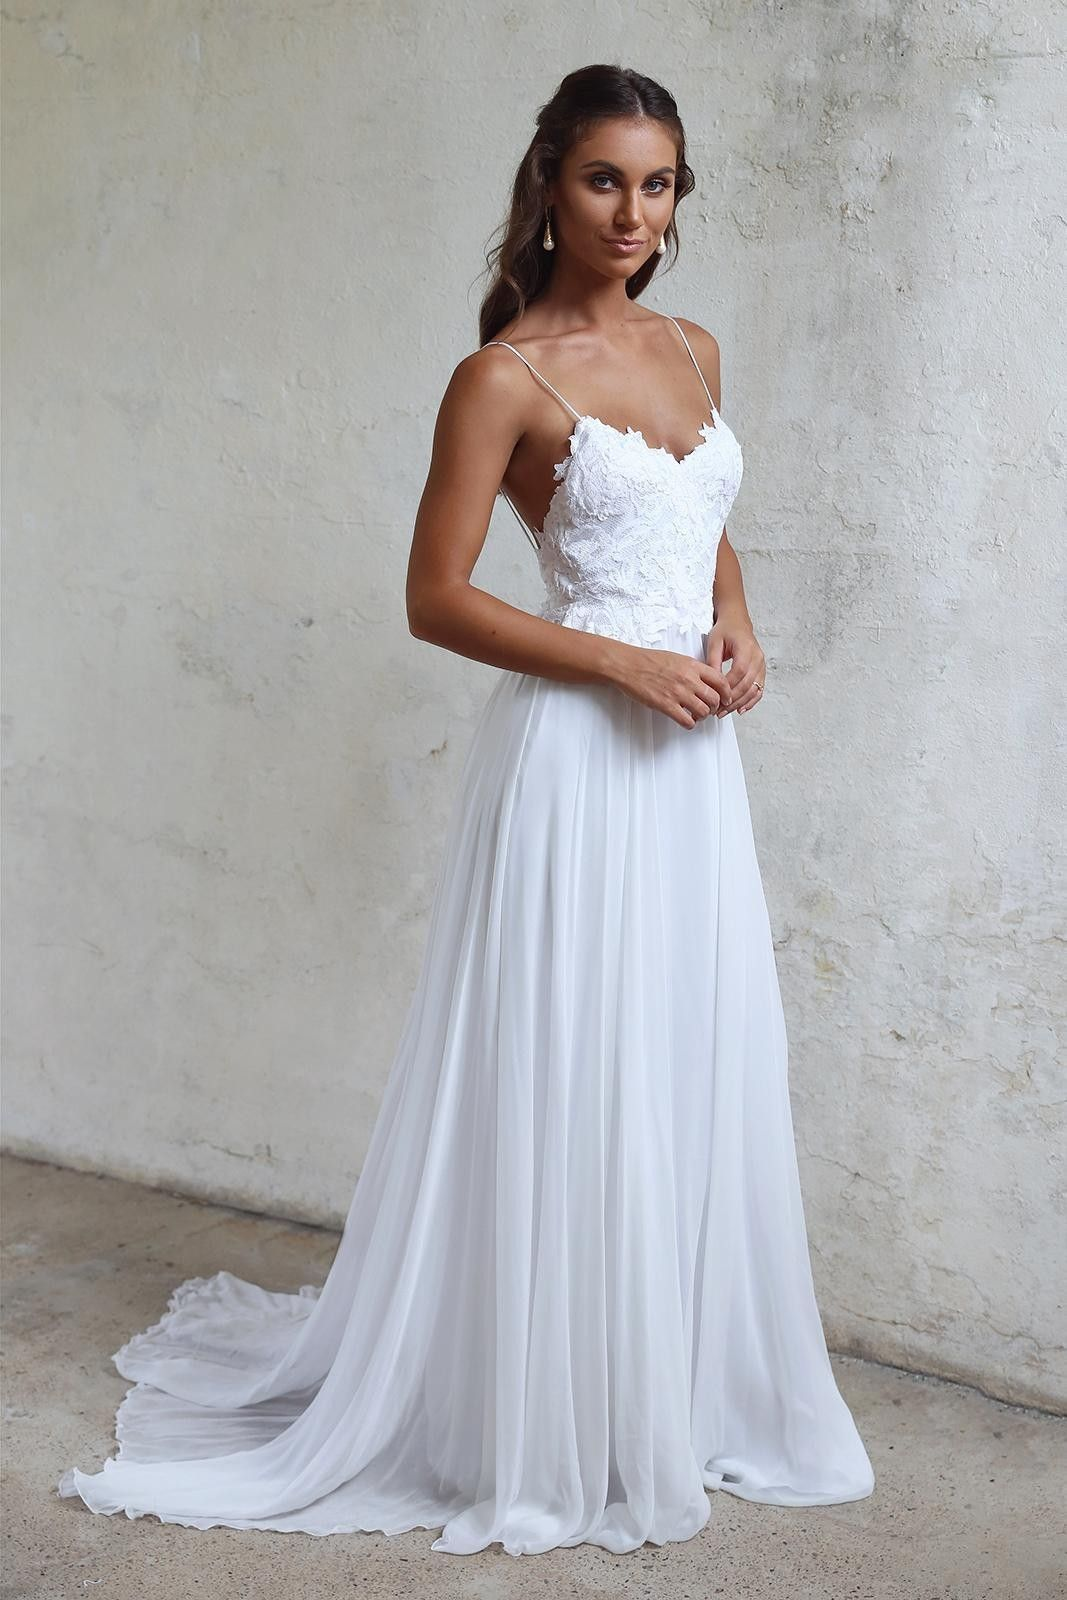 Lace spaghetti strap wedding dress  Pin by Lydia Johnson on Wedding Bells  Pinterest  Spaghetti